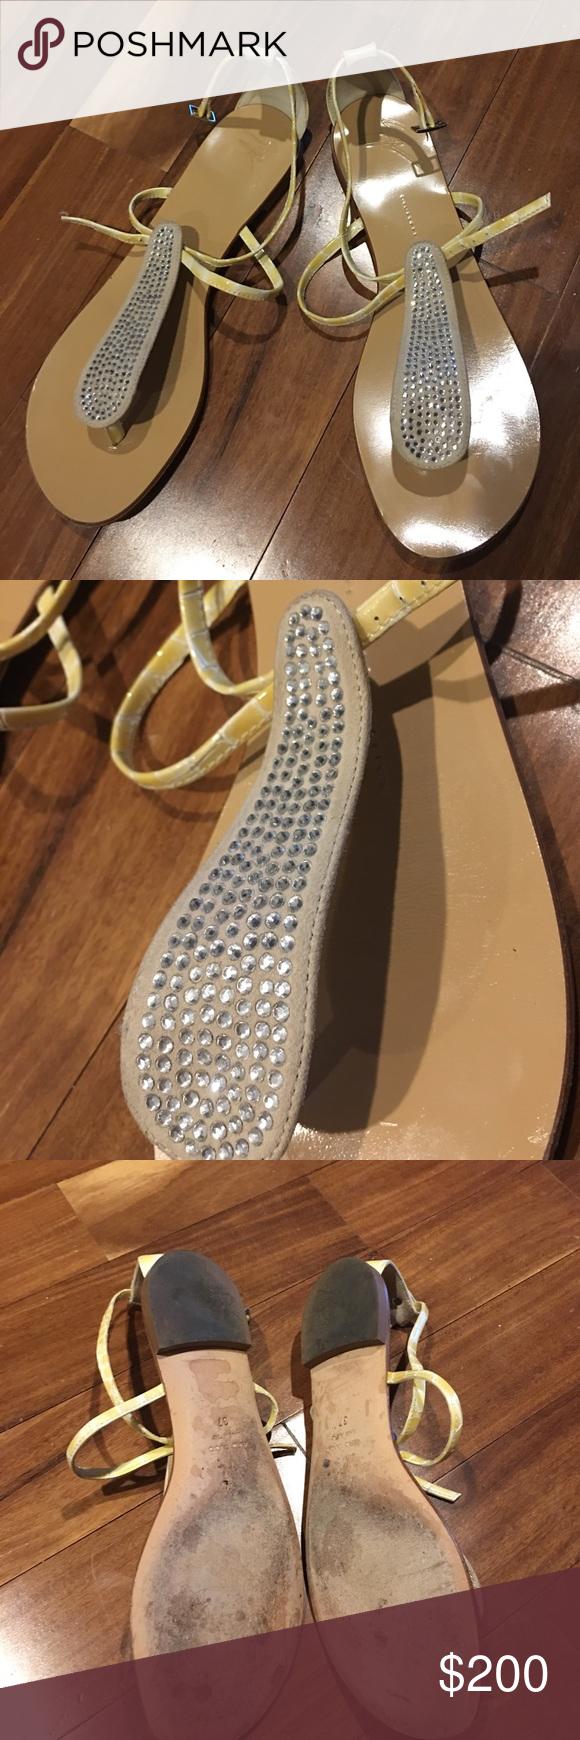 Giuseppe Zanotti Crystal Embellished Sandal Giuseppe Zanotti Crystal Embellished Patent Crocco Thong Sandal. Size 7. In great condition. Retail $795. Giuseppe Zanotti Shoes Sandals